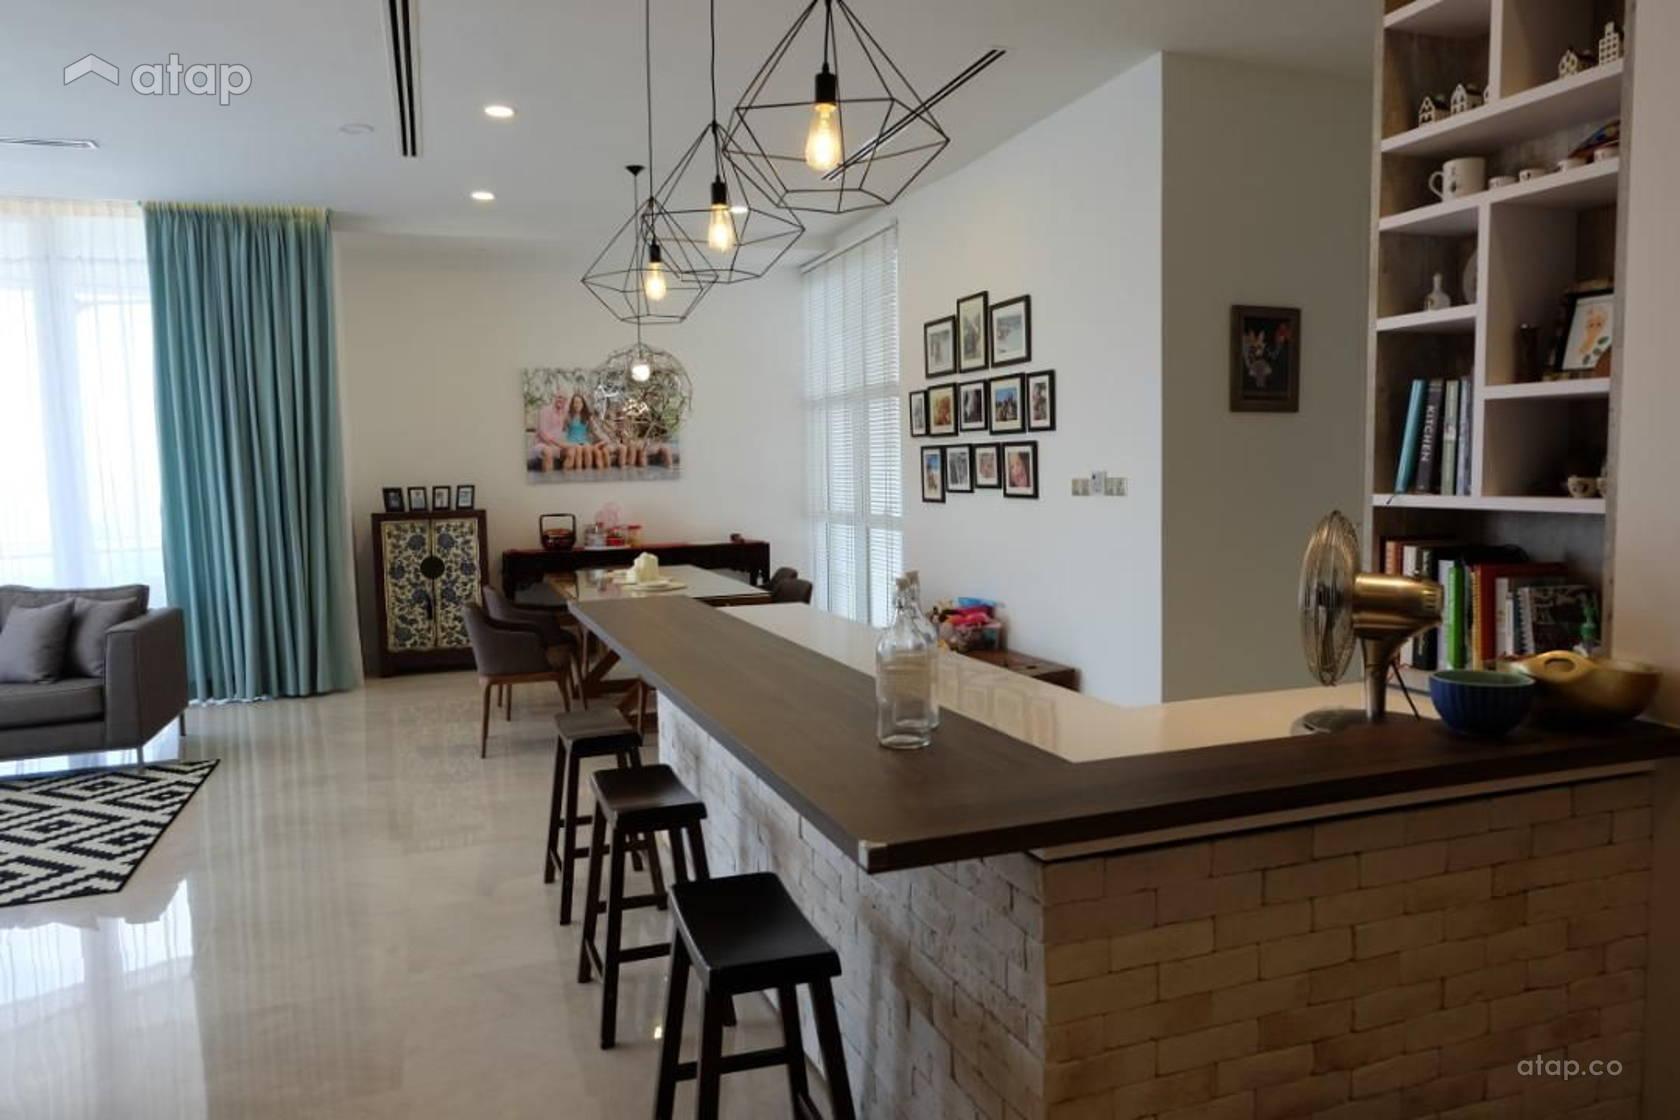 sunway palazzio interior design renovation ideas photos and price 1 16